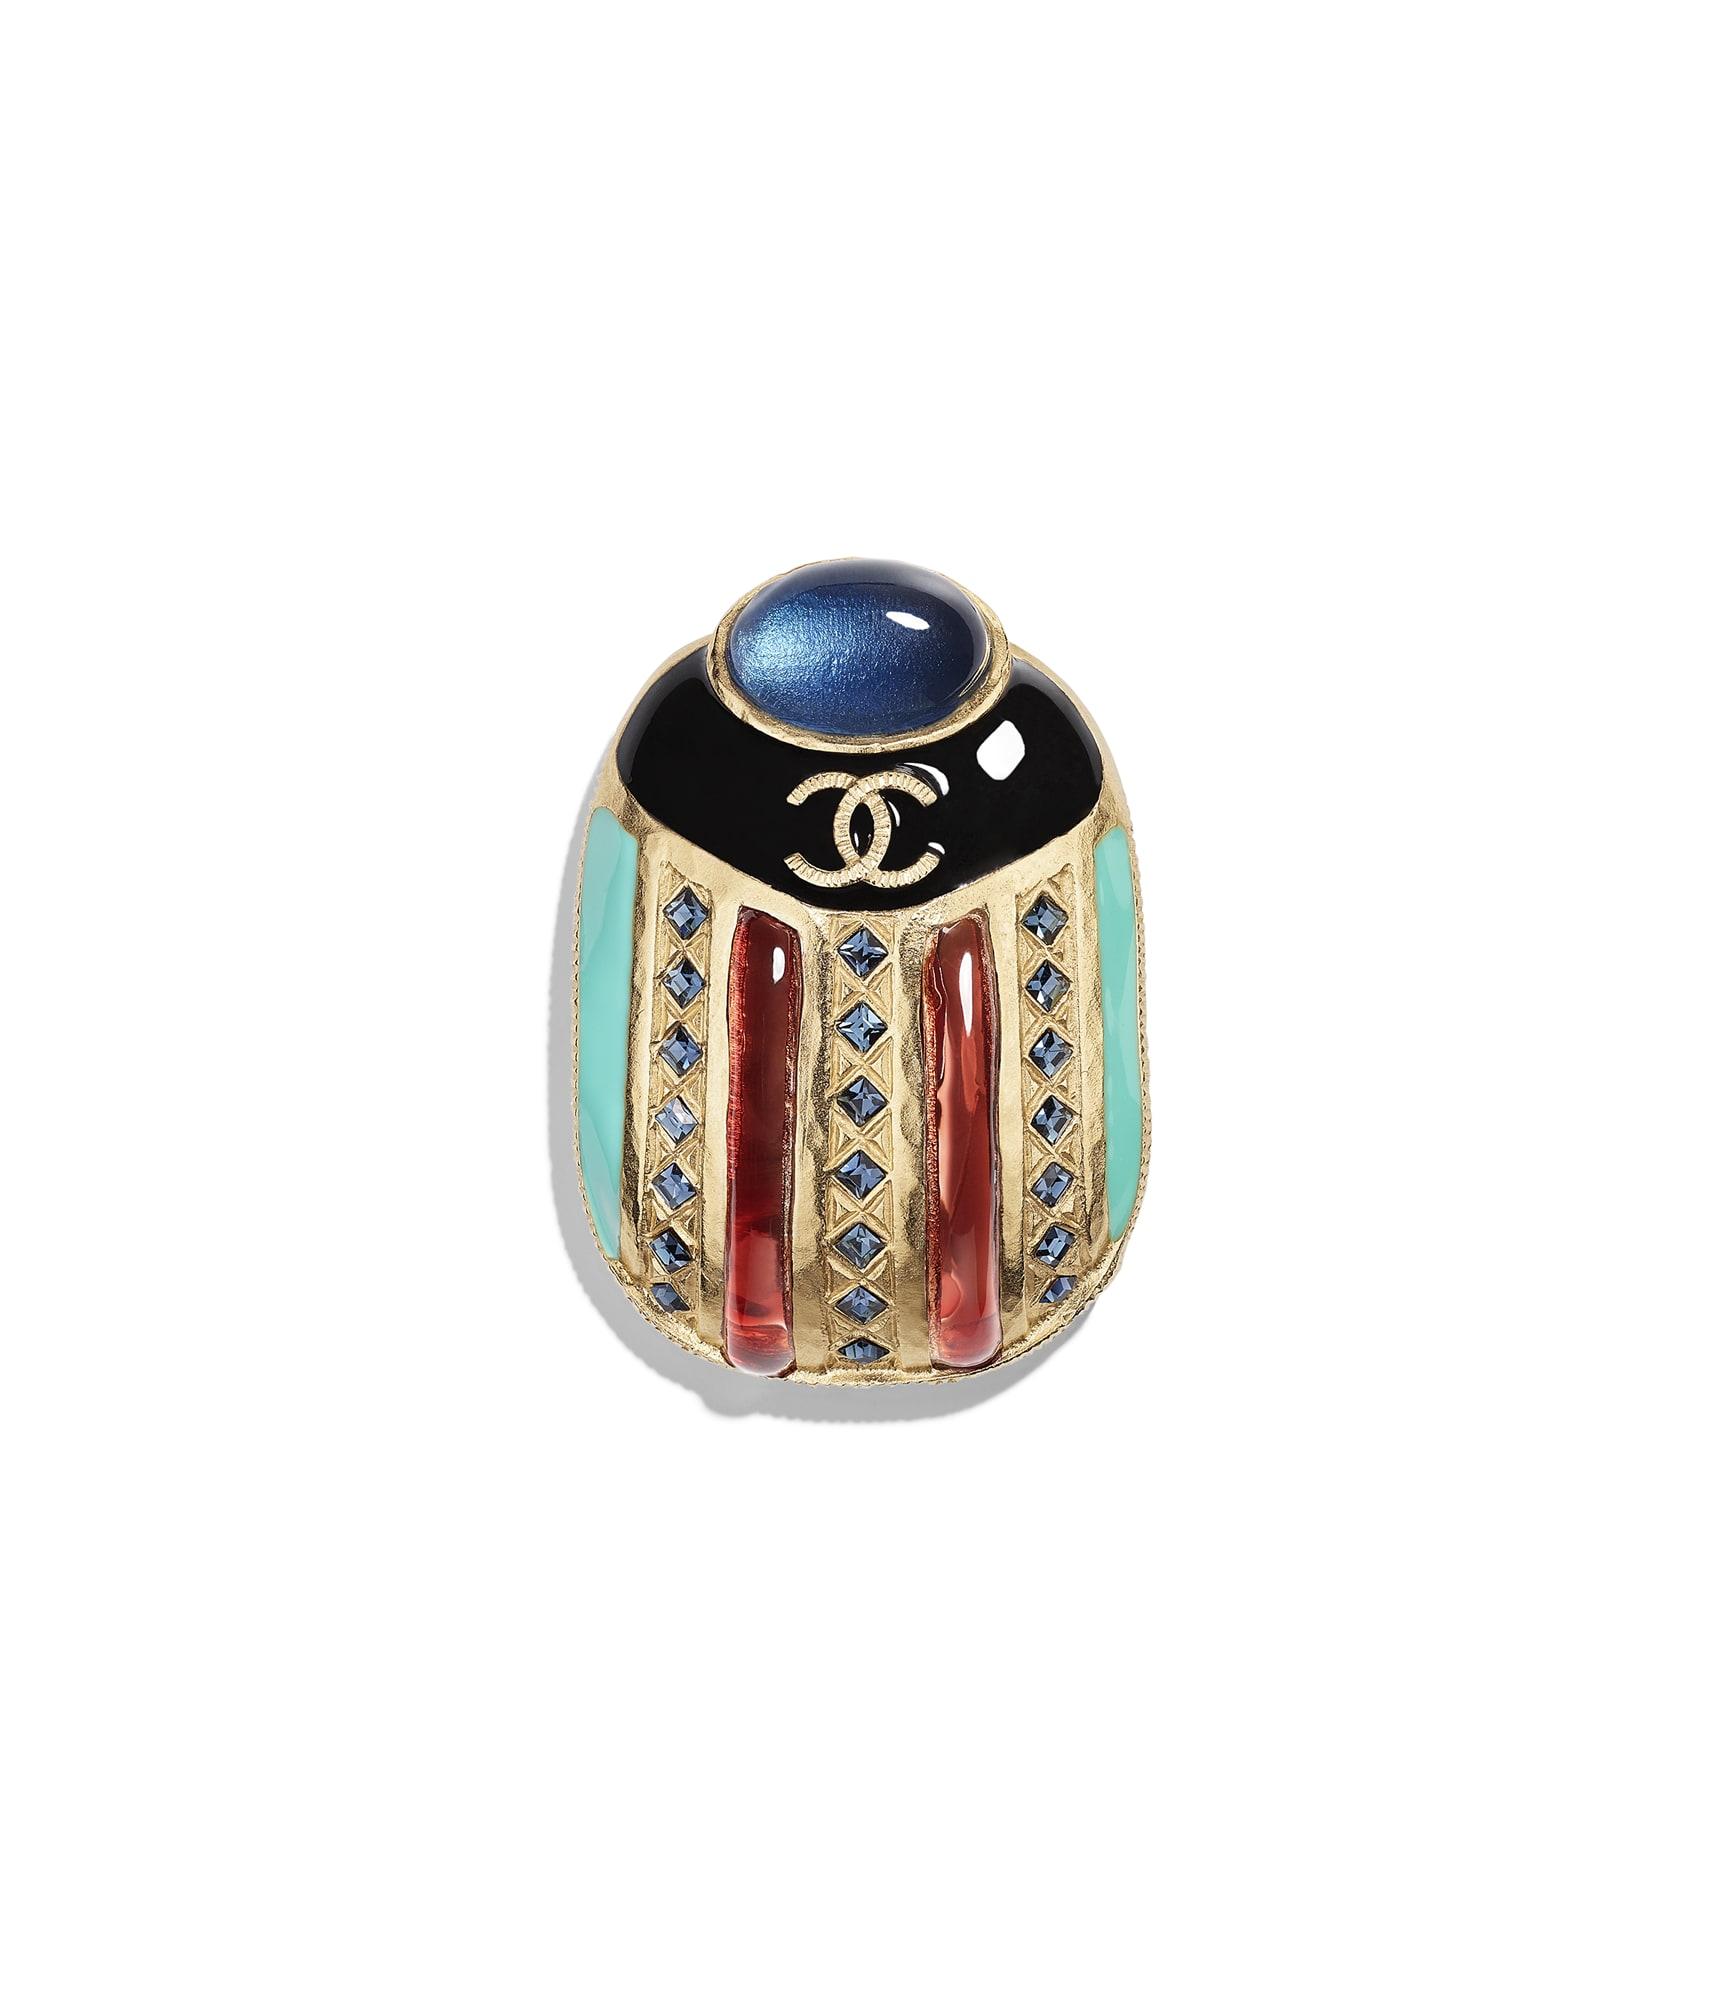 c8429510ec0 Brooches - Costume Jewelry - CHANEL